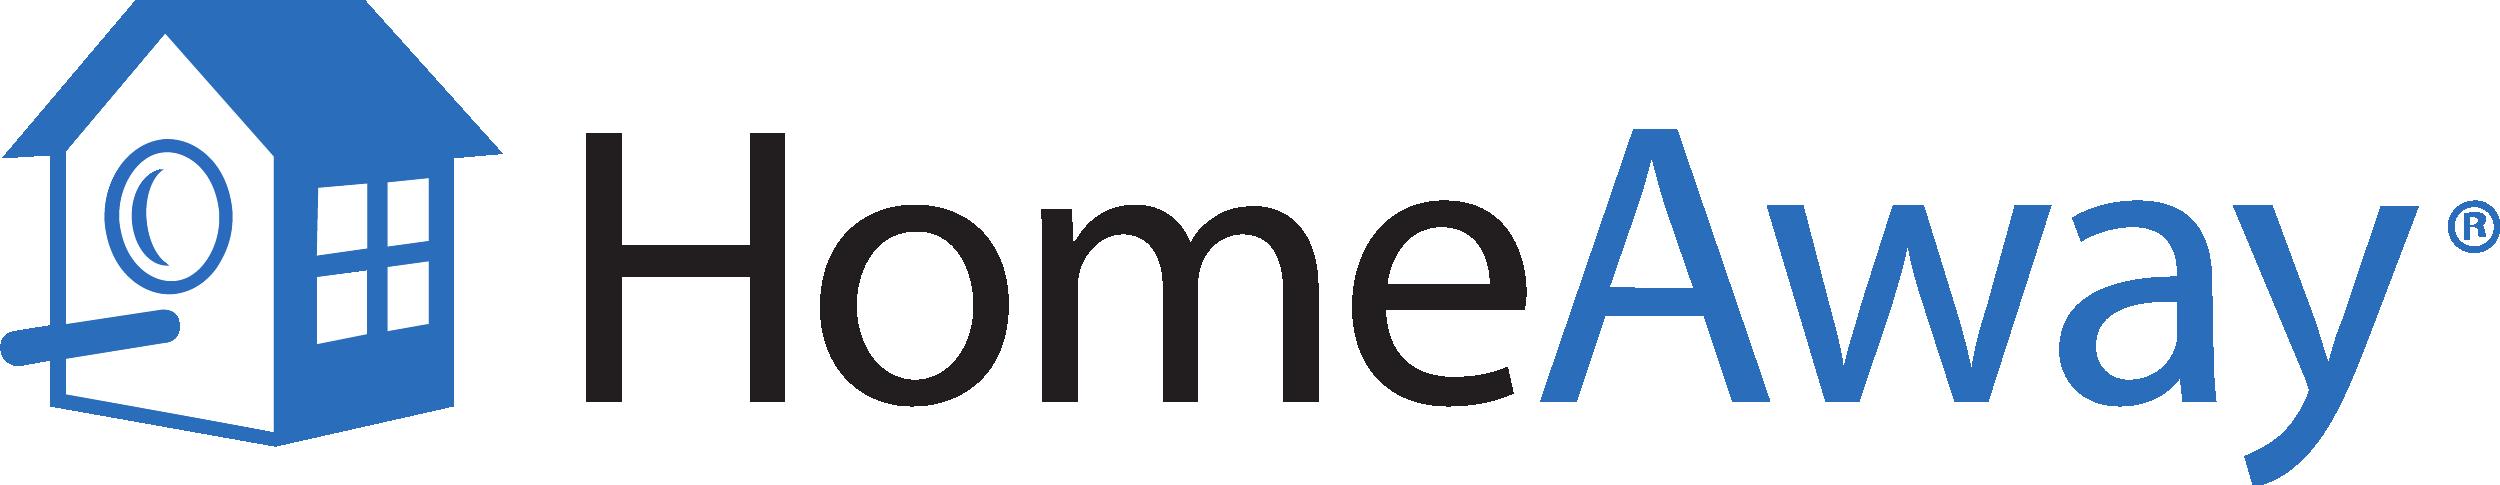 Home Away Logo.png